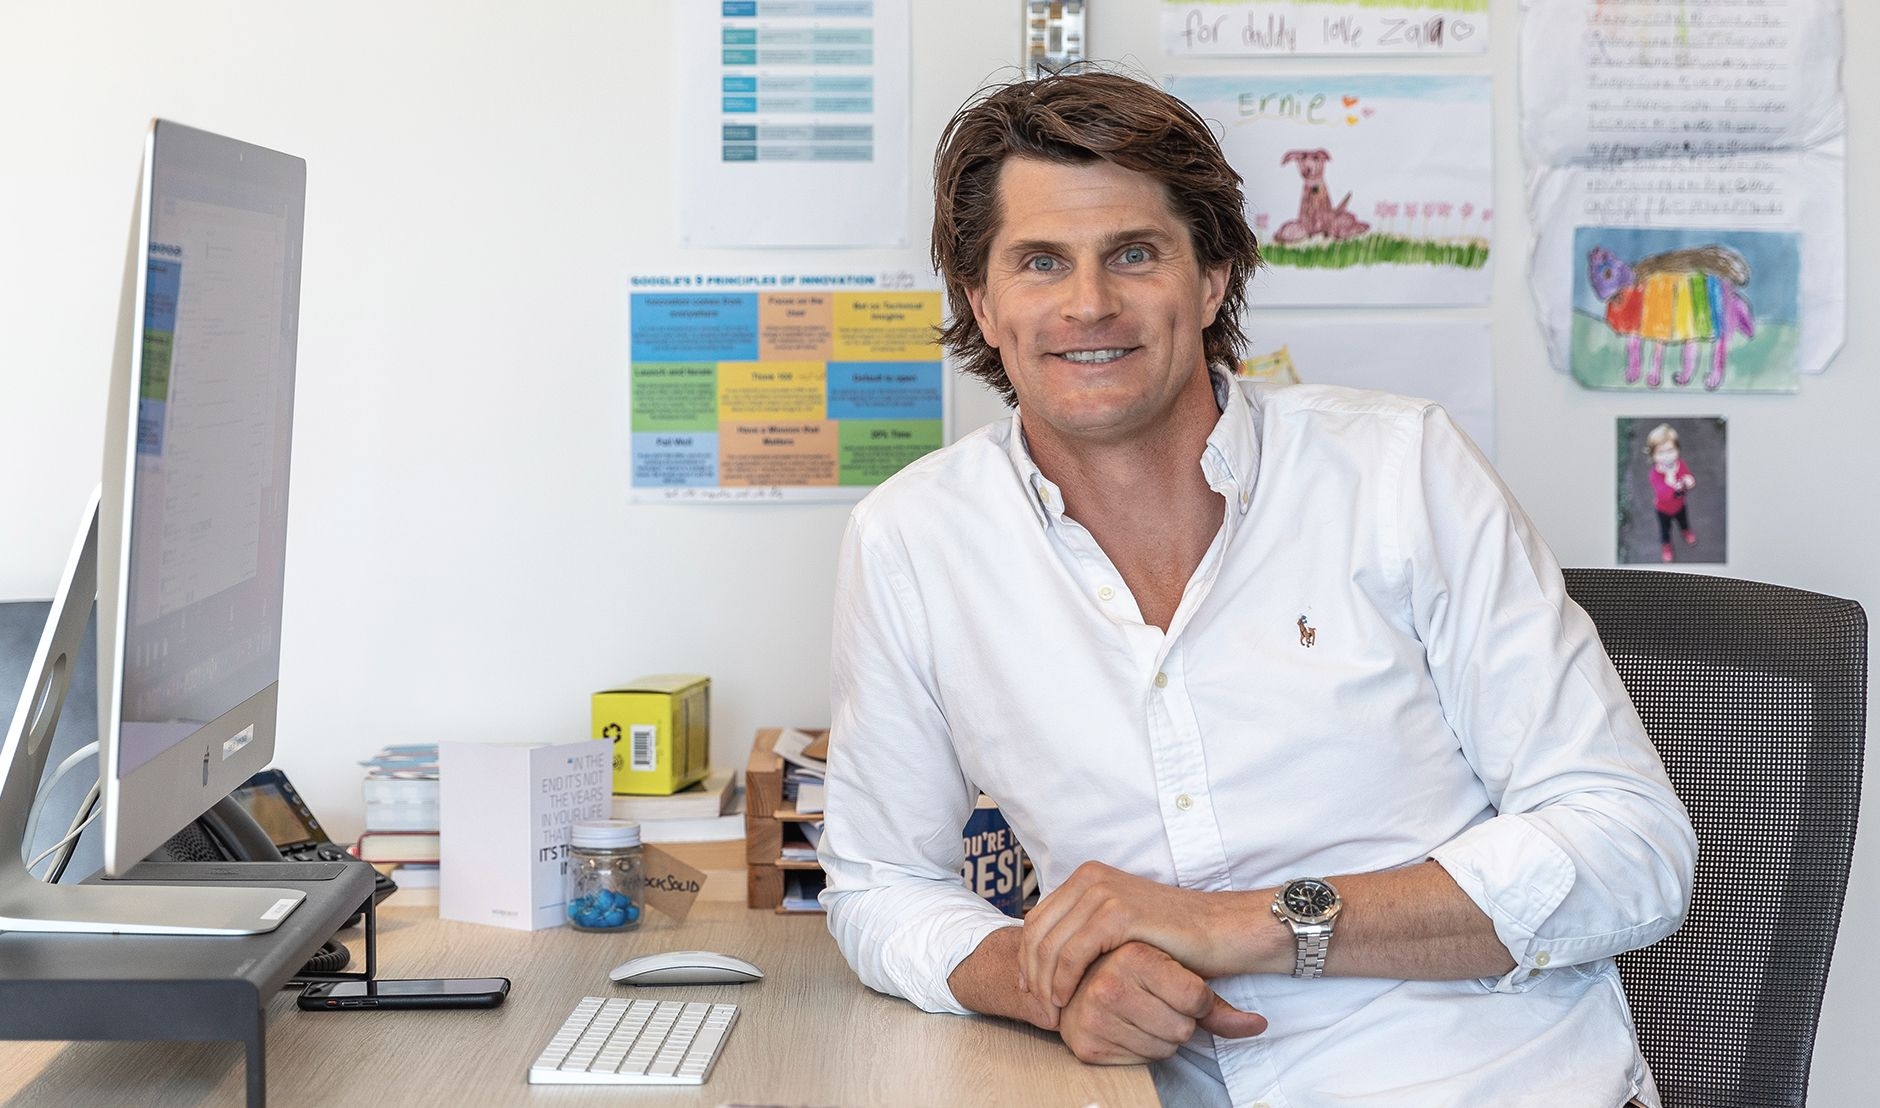 Dr Sam Hazledine - wellbeing for doctors